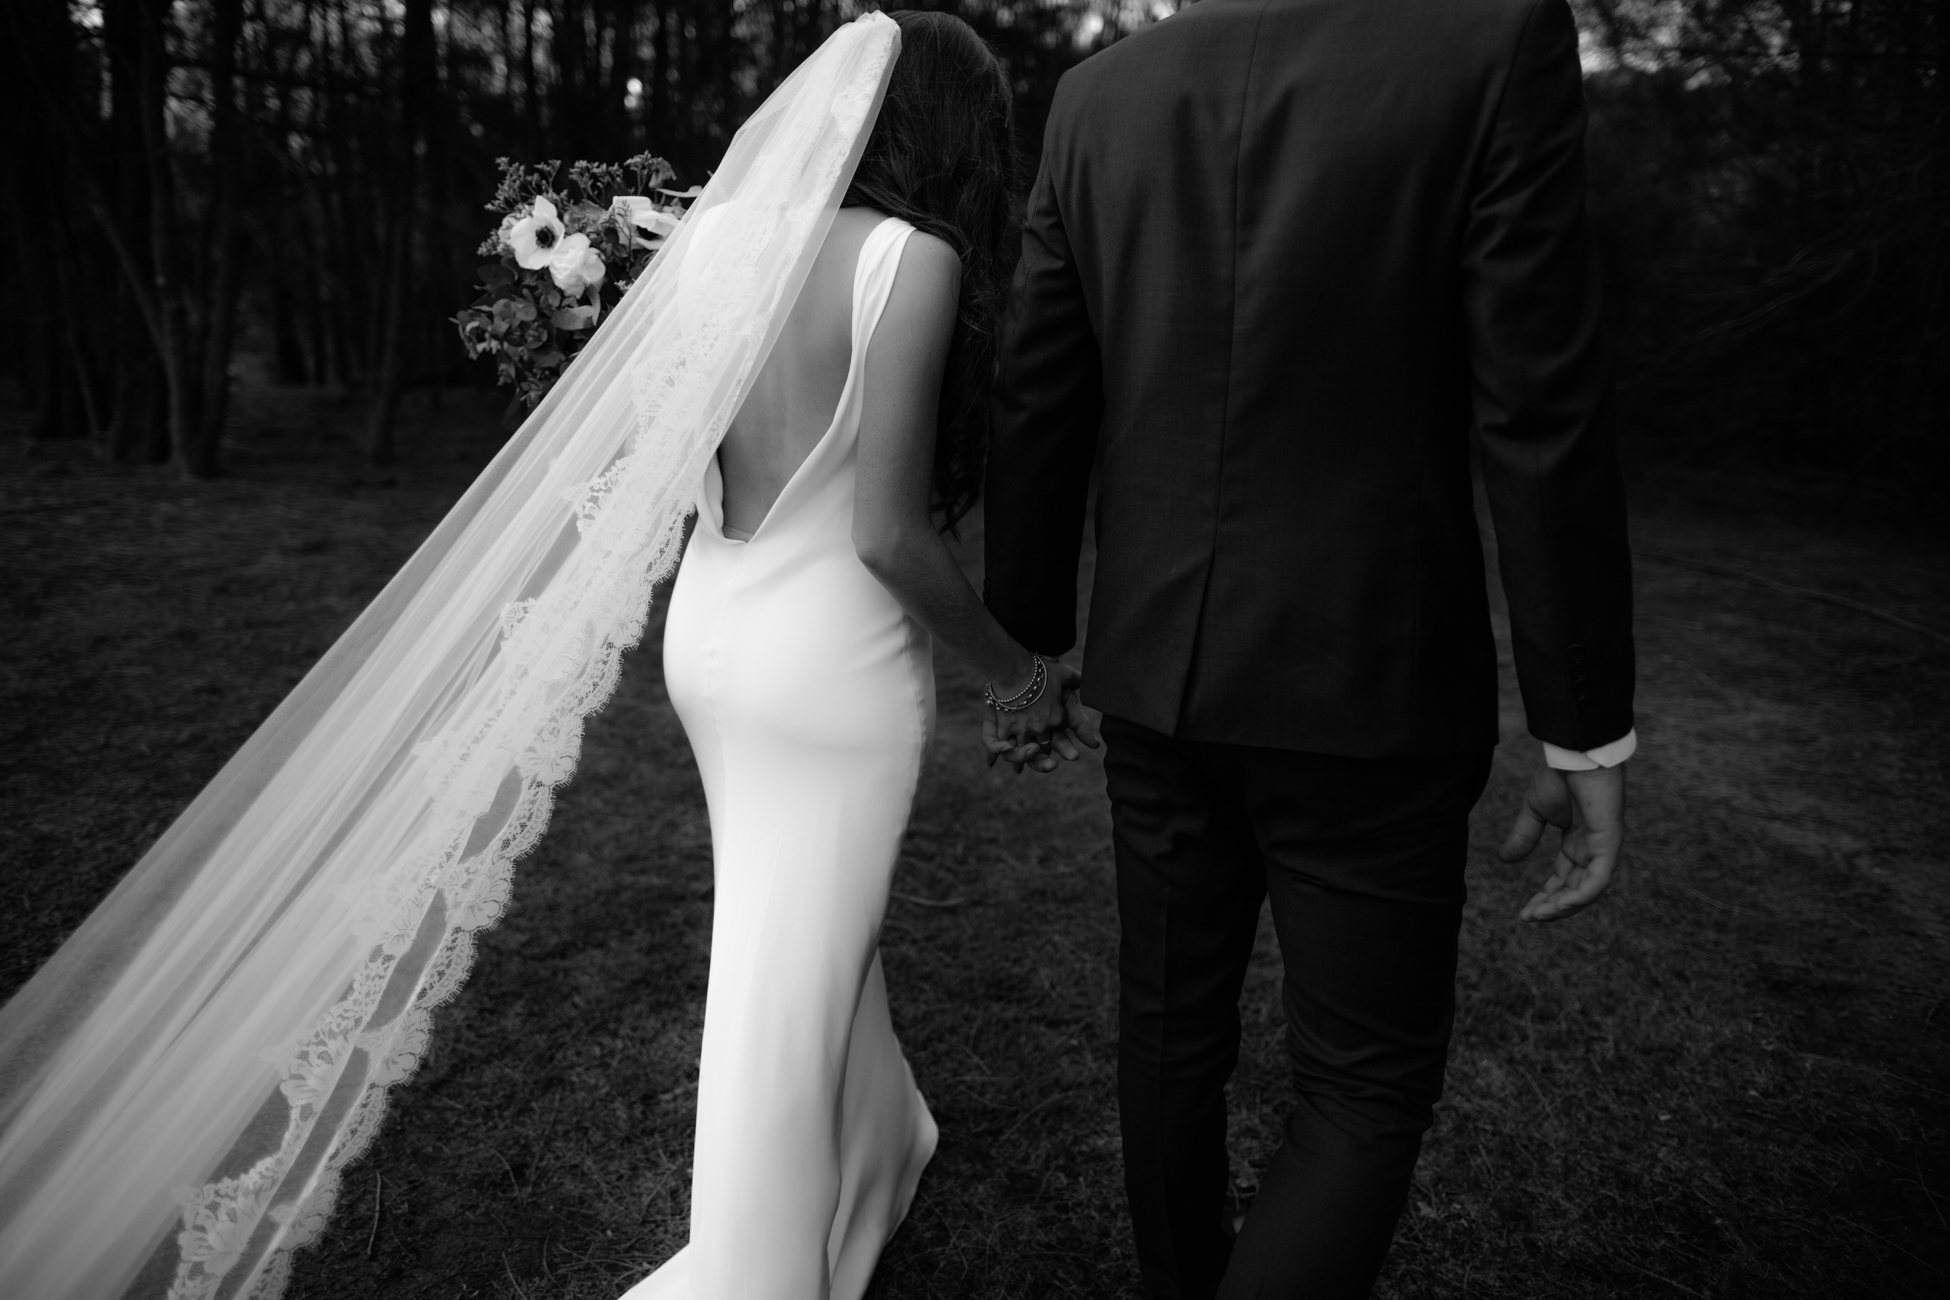 Matt_Godkin_Wedding_Photography-40.jpg